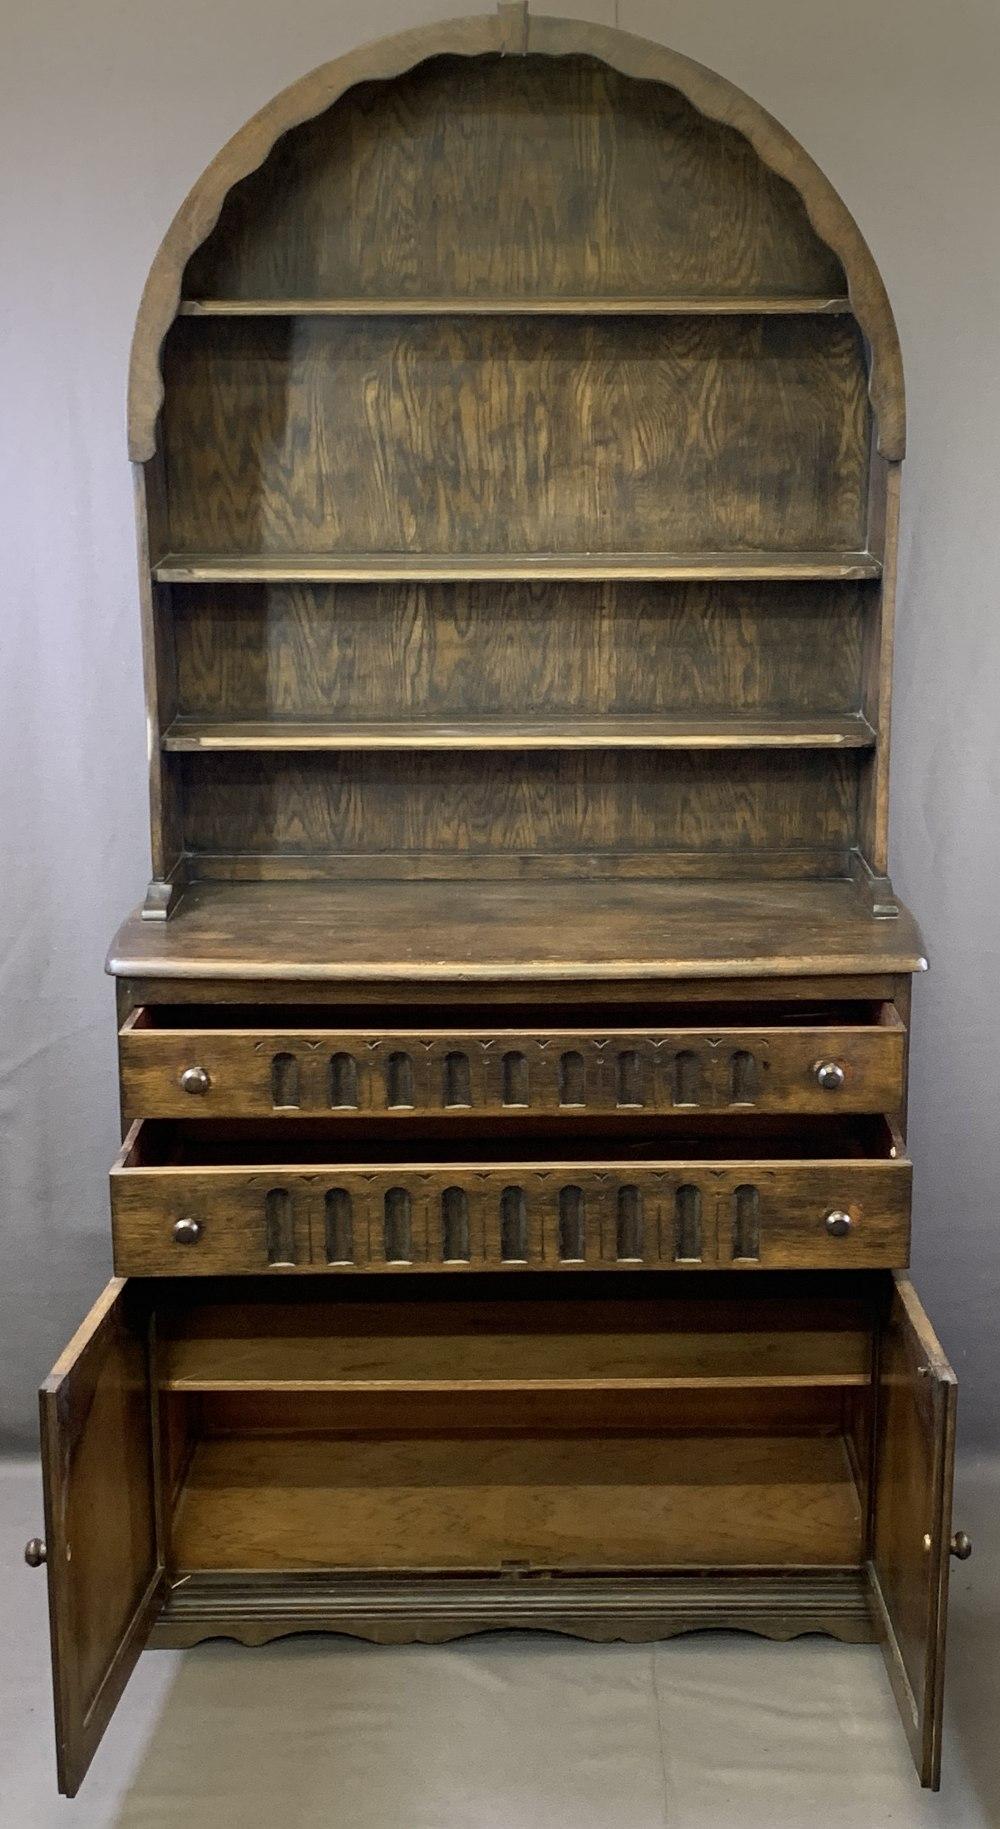 VINTAGE OAK DUTCH TOP DRESSER and an oak barley twist gateleg dining table, 191cms overall H, 96. - Image 2 of 5